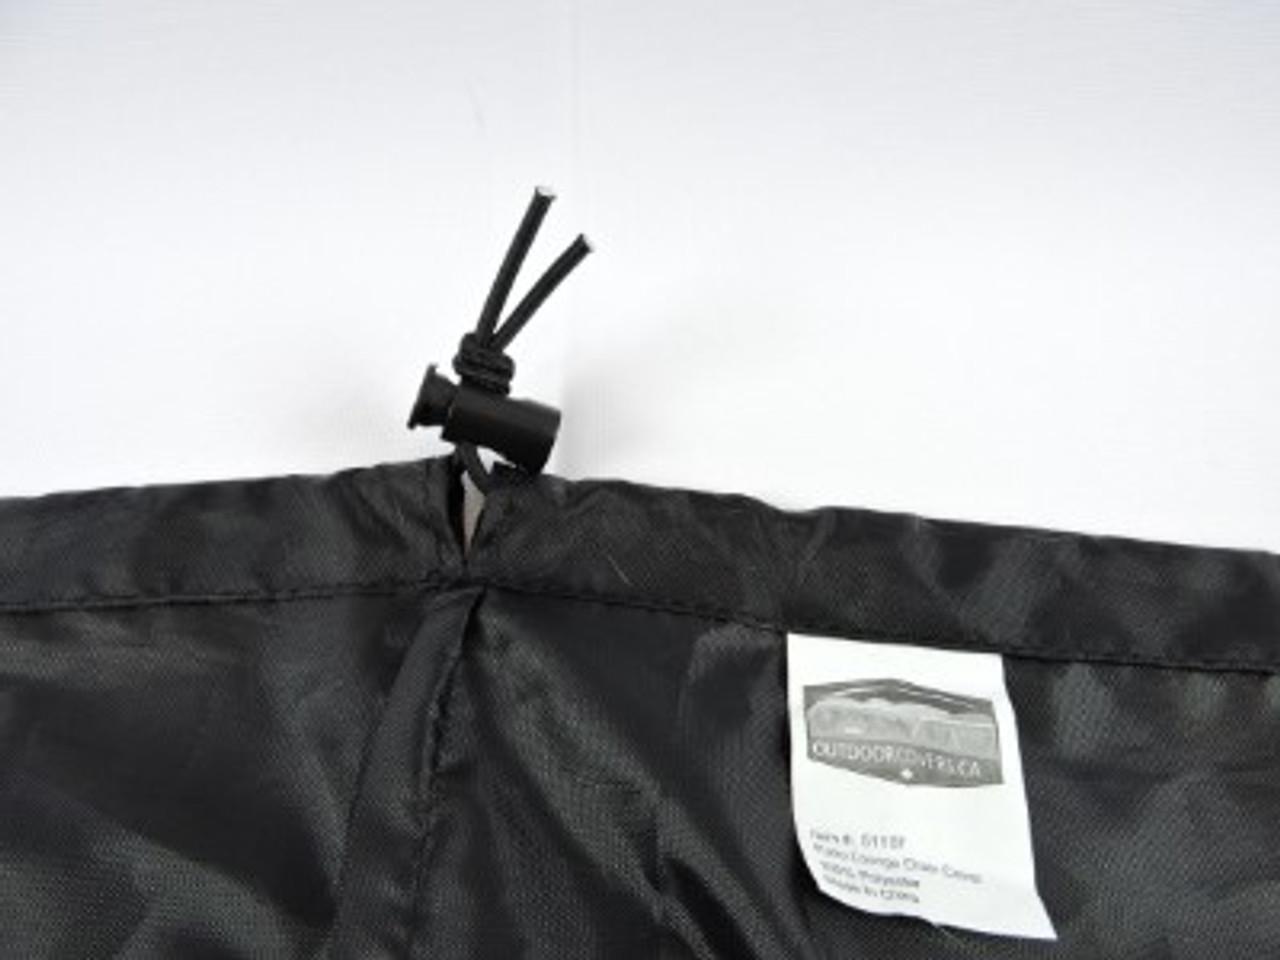 Advantage shock cord hem with adjustable lock for snug fit